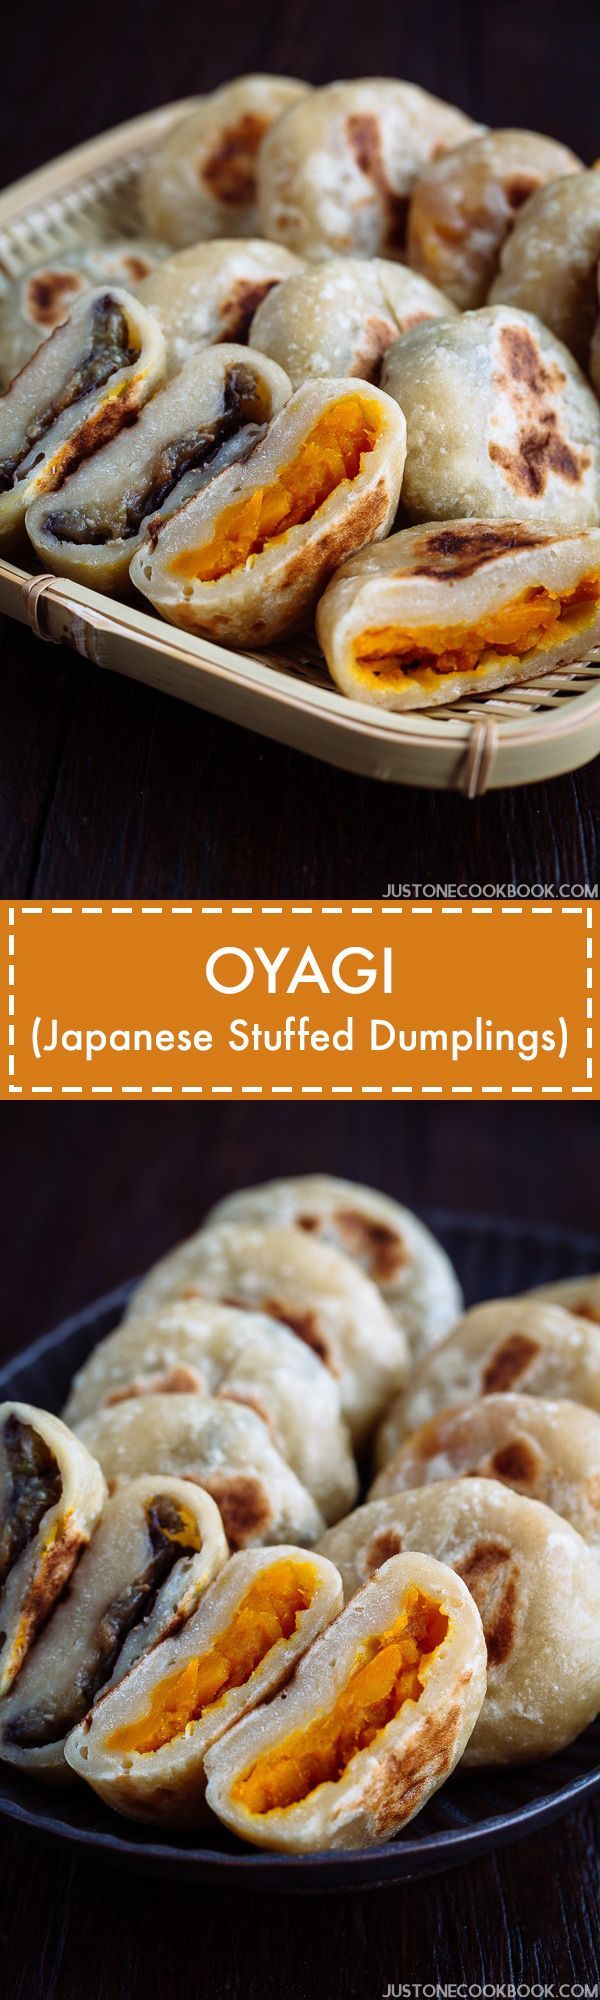 Oyaki (Japanese Stuffed Dumplings) おやき   Easy Japanese Recipes at JustOneCookbook.com